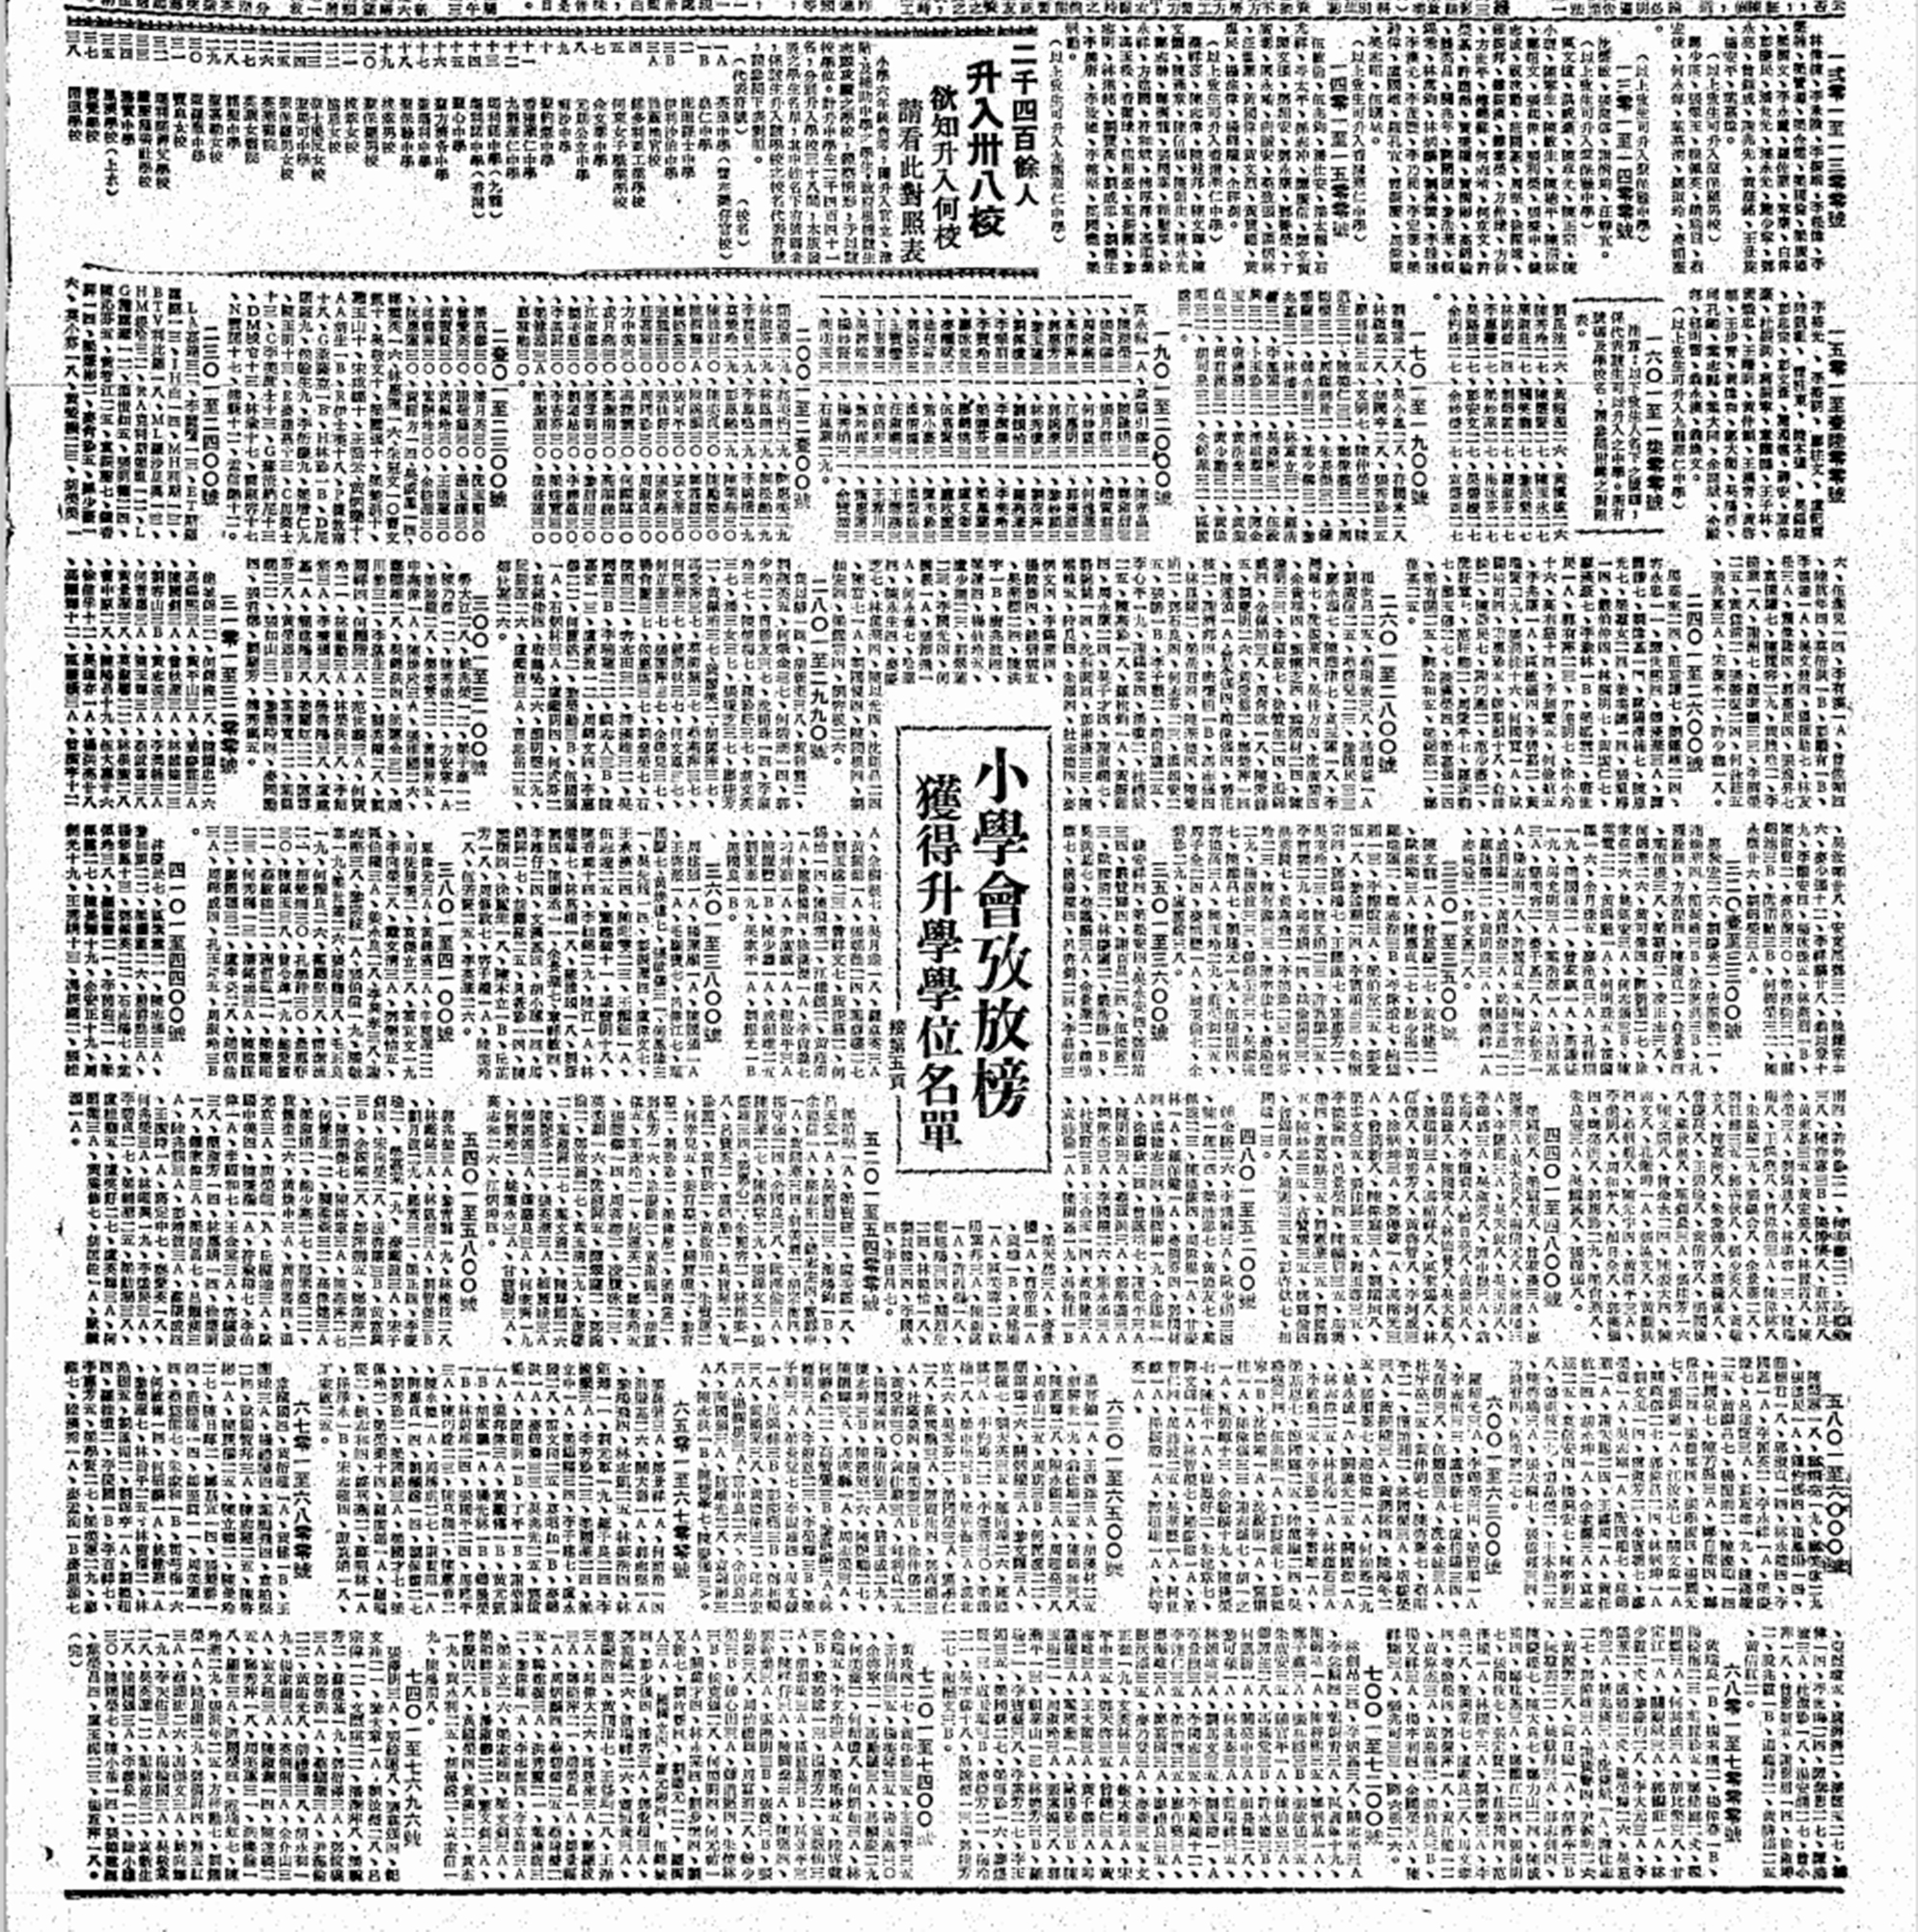 http://ubeat.com.cuhk.edu.hk/wp-content/uploads/2018/135_hkhistory_result.jpg